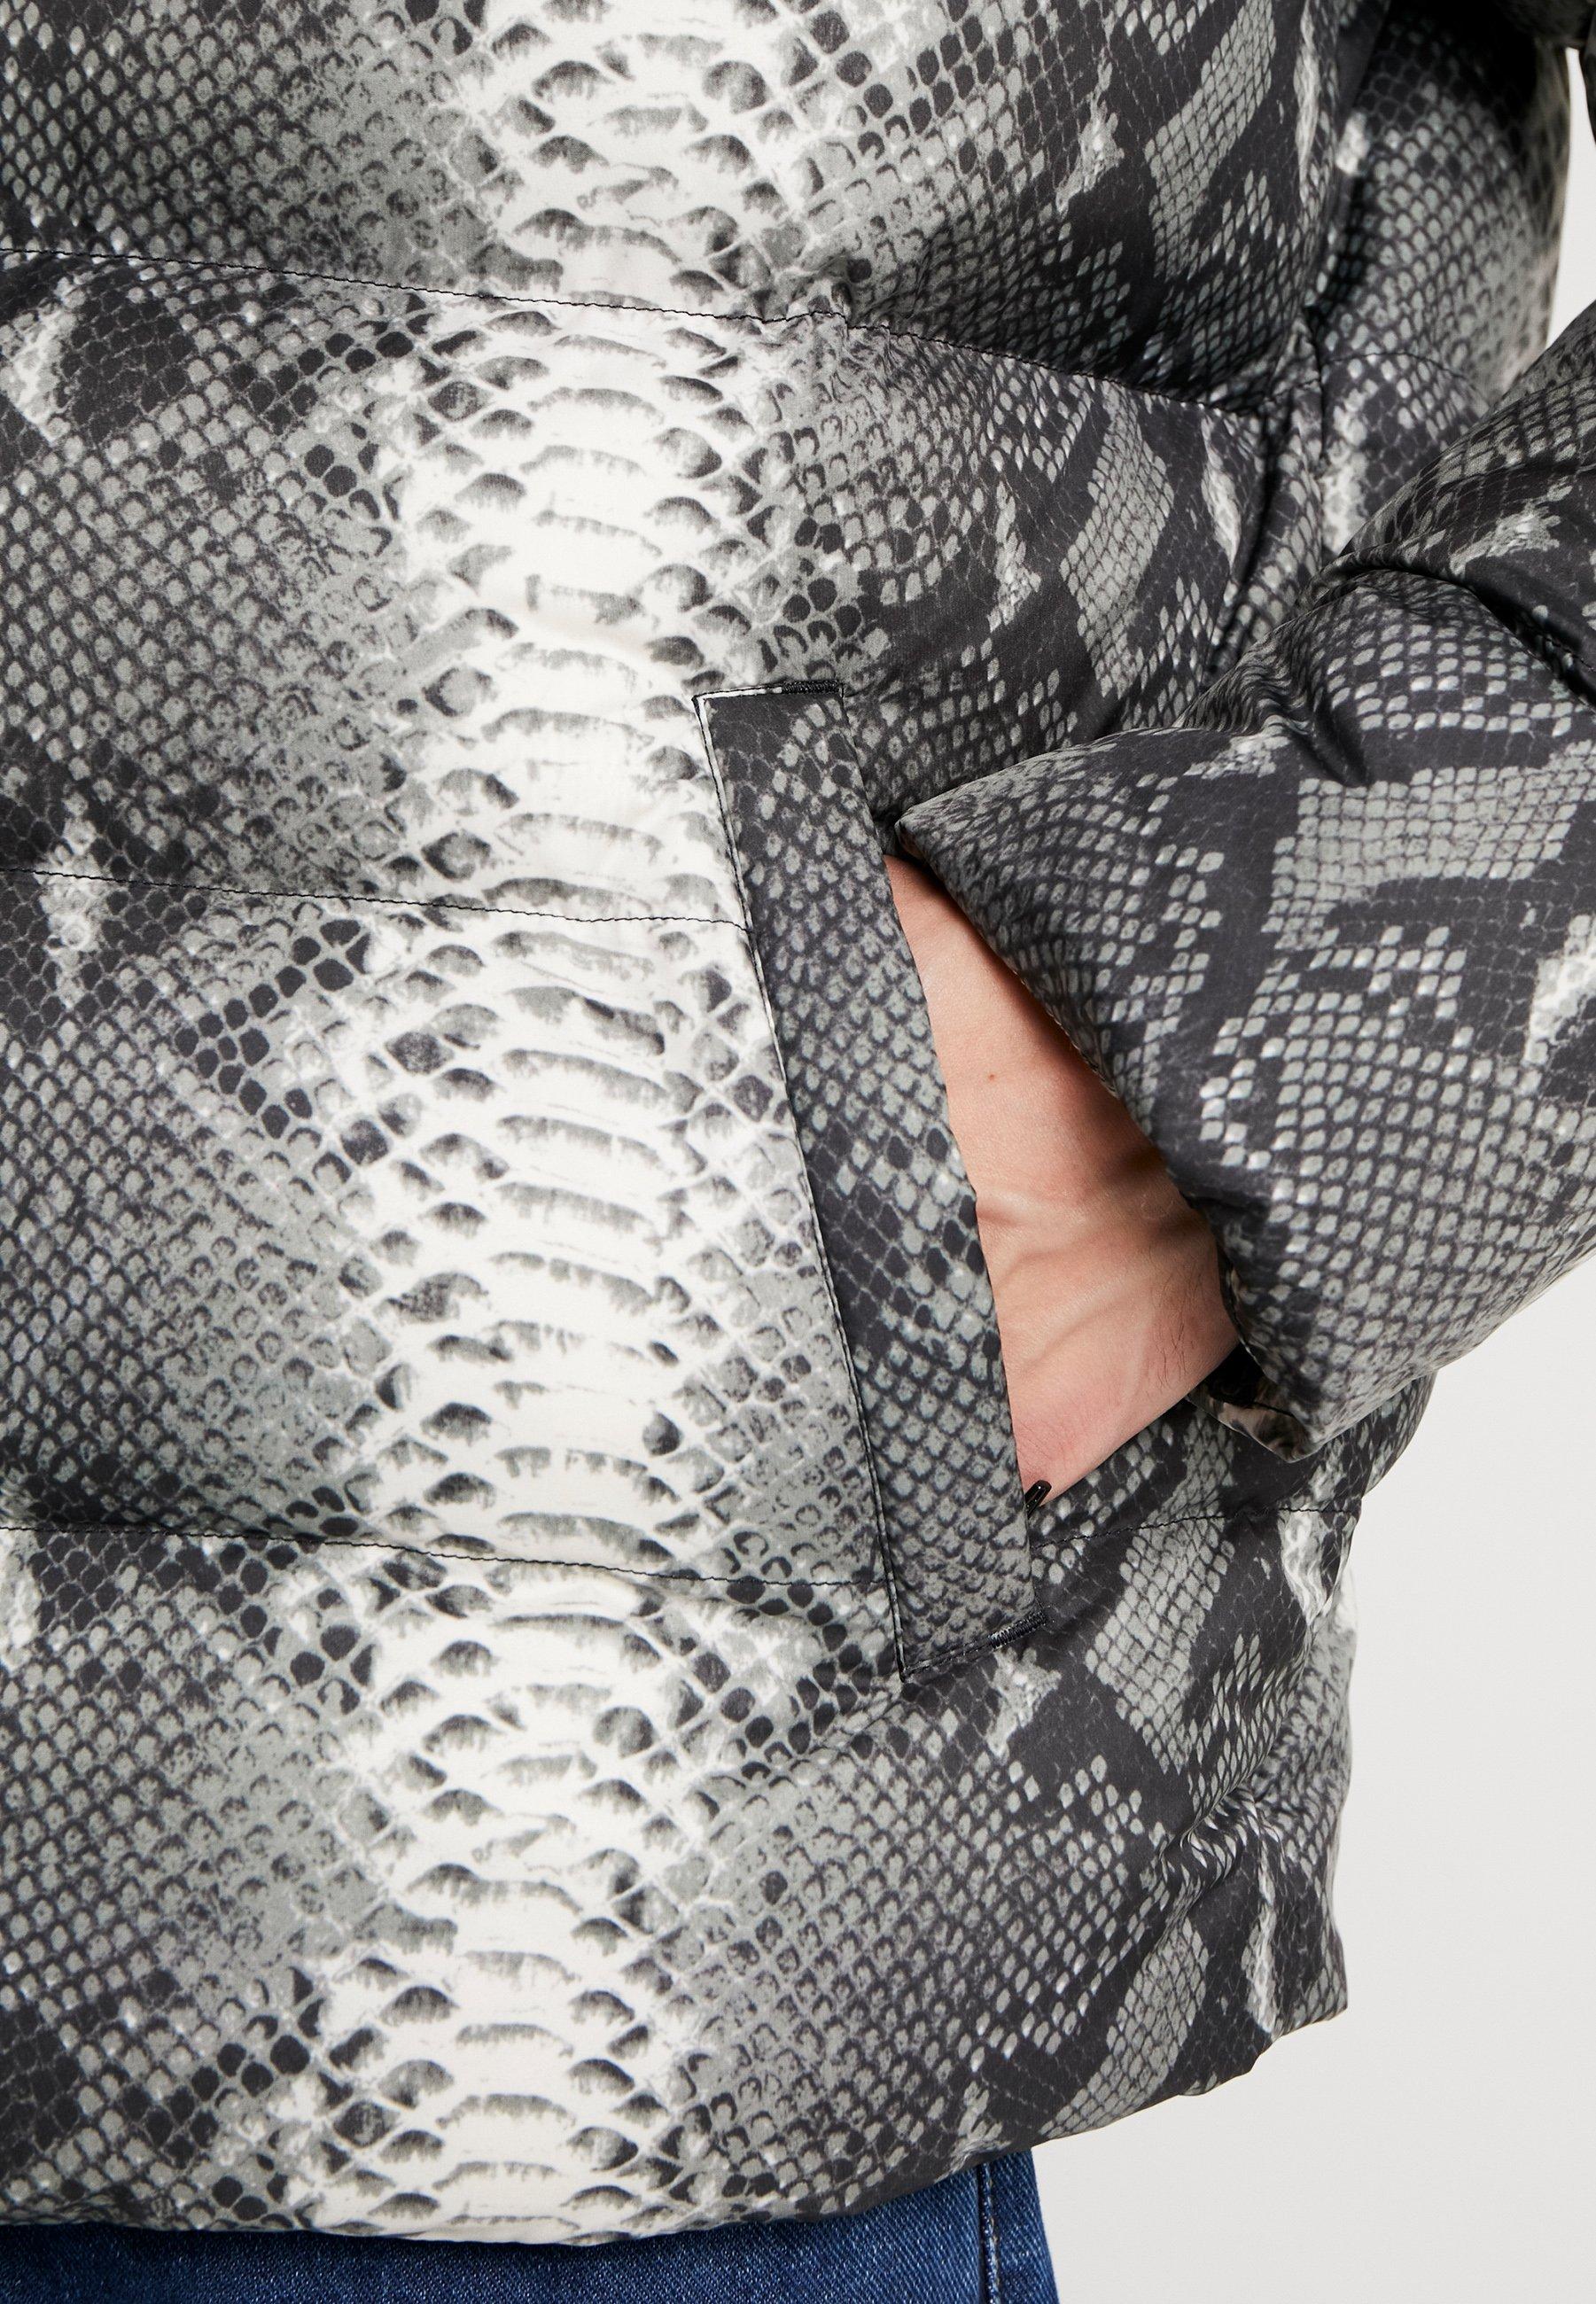 JacketGiacca Invernale Hooded Urban Puffer Classics Greysnake orCxedWQB